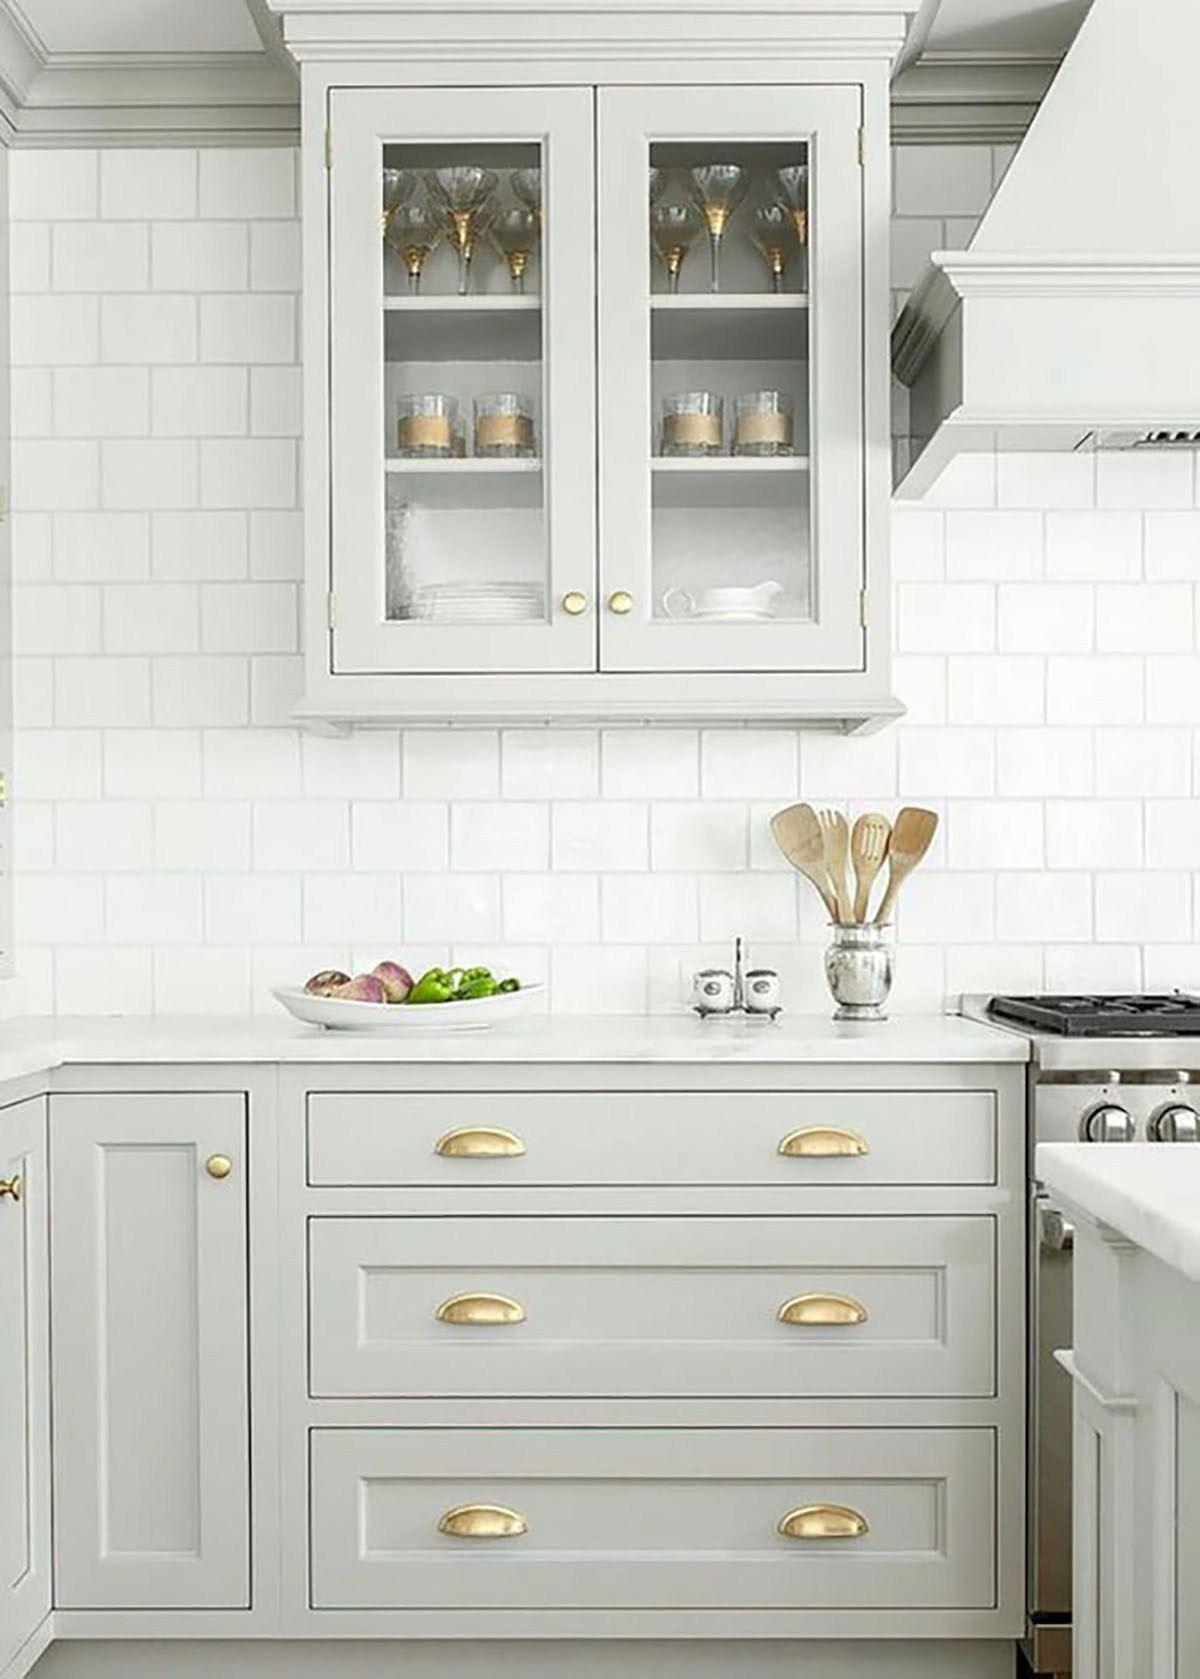 5 Kitchens That Inspire -   17 sage green kitchen cabinets paint ideas